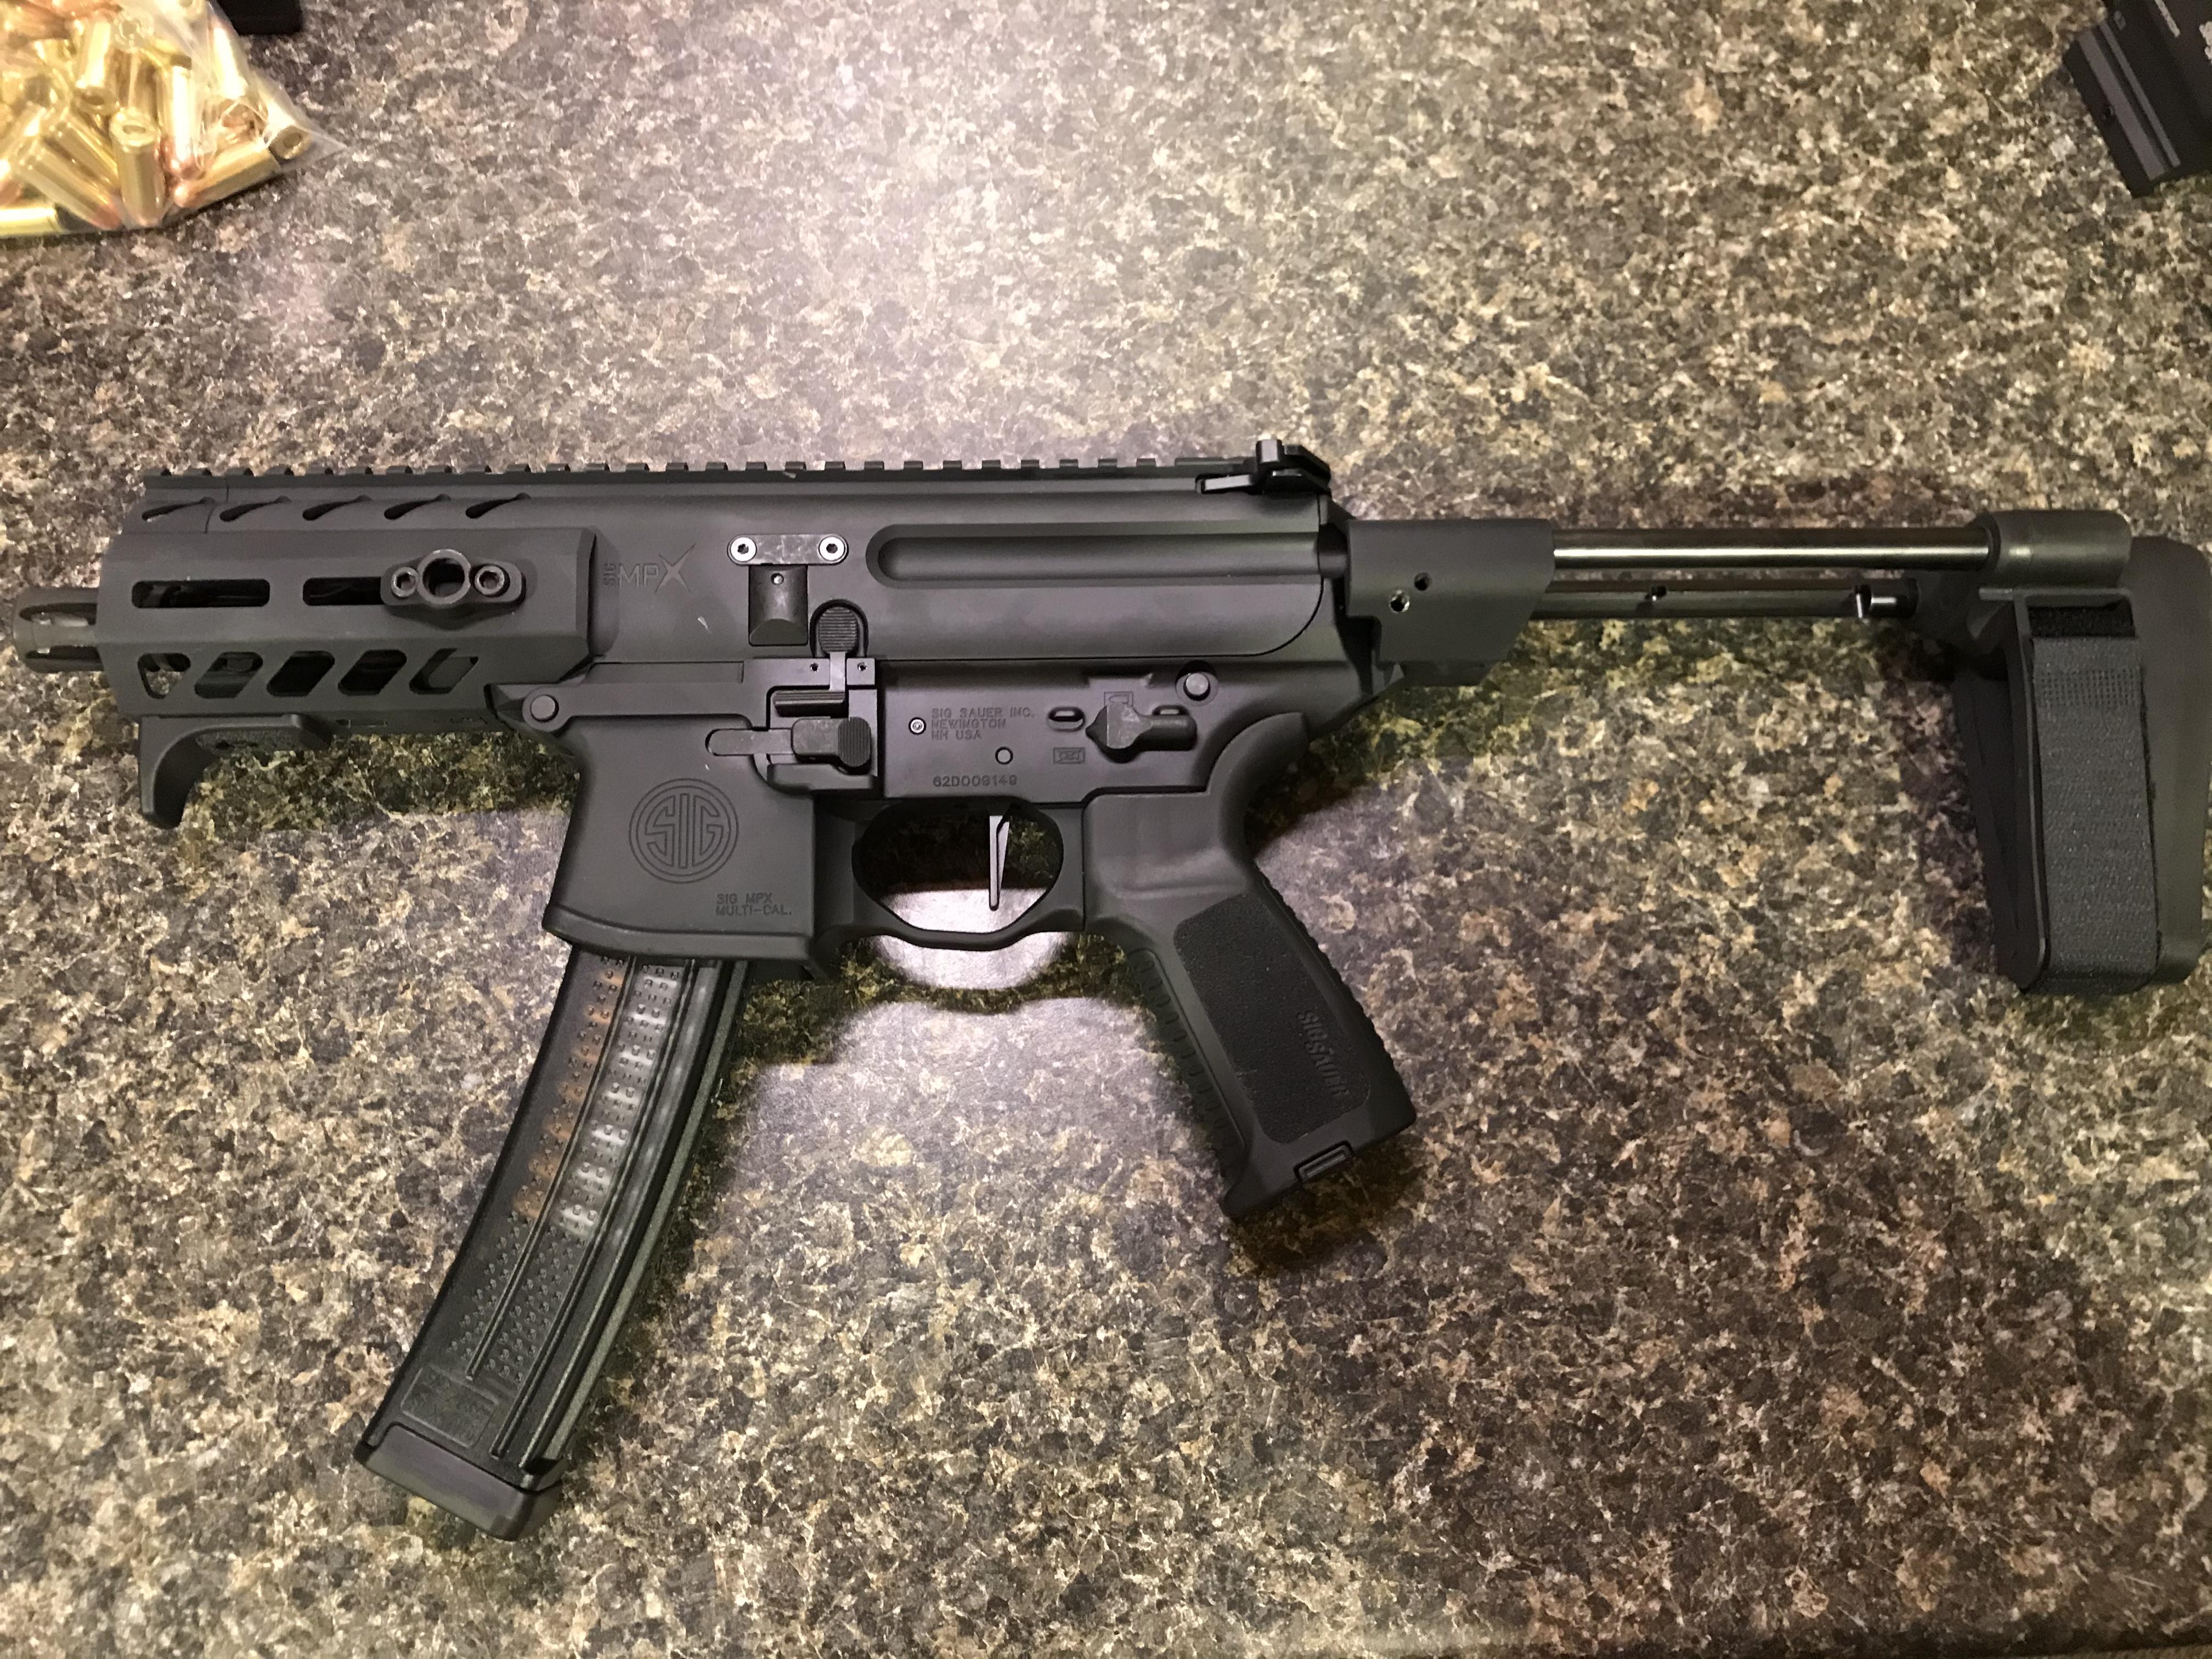 WTS:  SIG MPX-K 9mm Pistol-dff89702-19aa-4d8a-aa4d-62ffdb068127.jpeg